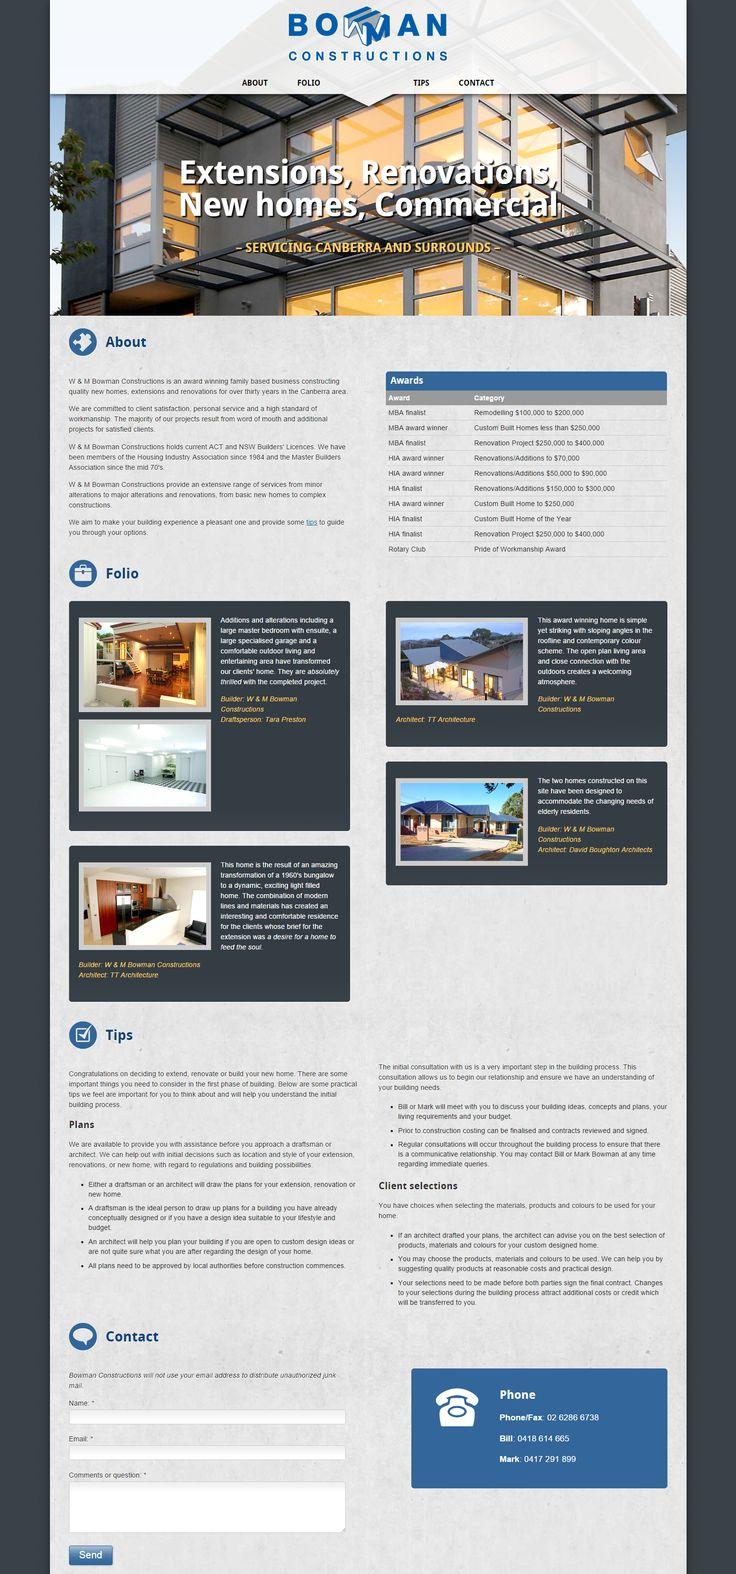 Bowman Constructions | from Elfshot Web Design Folio